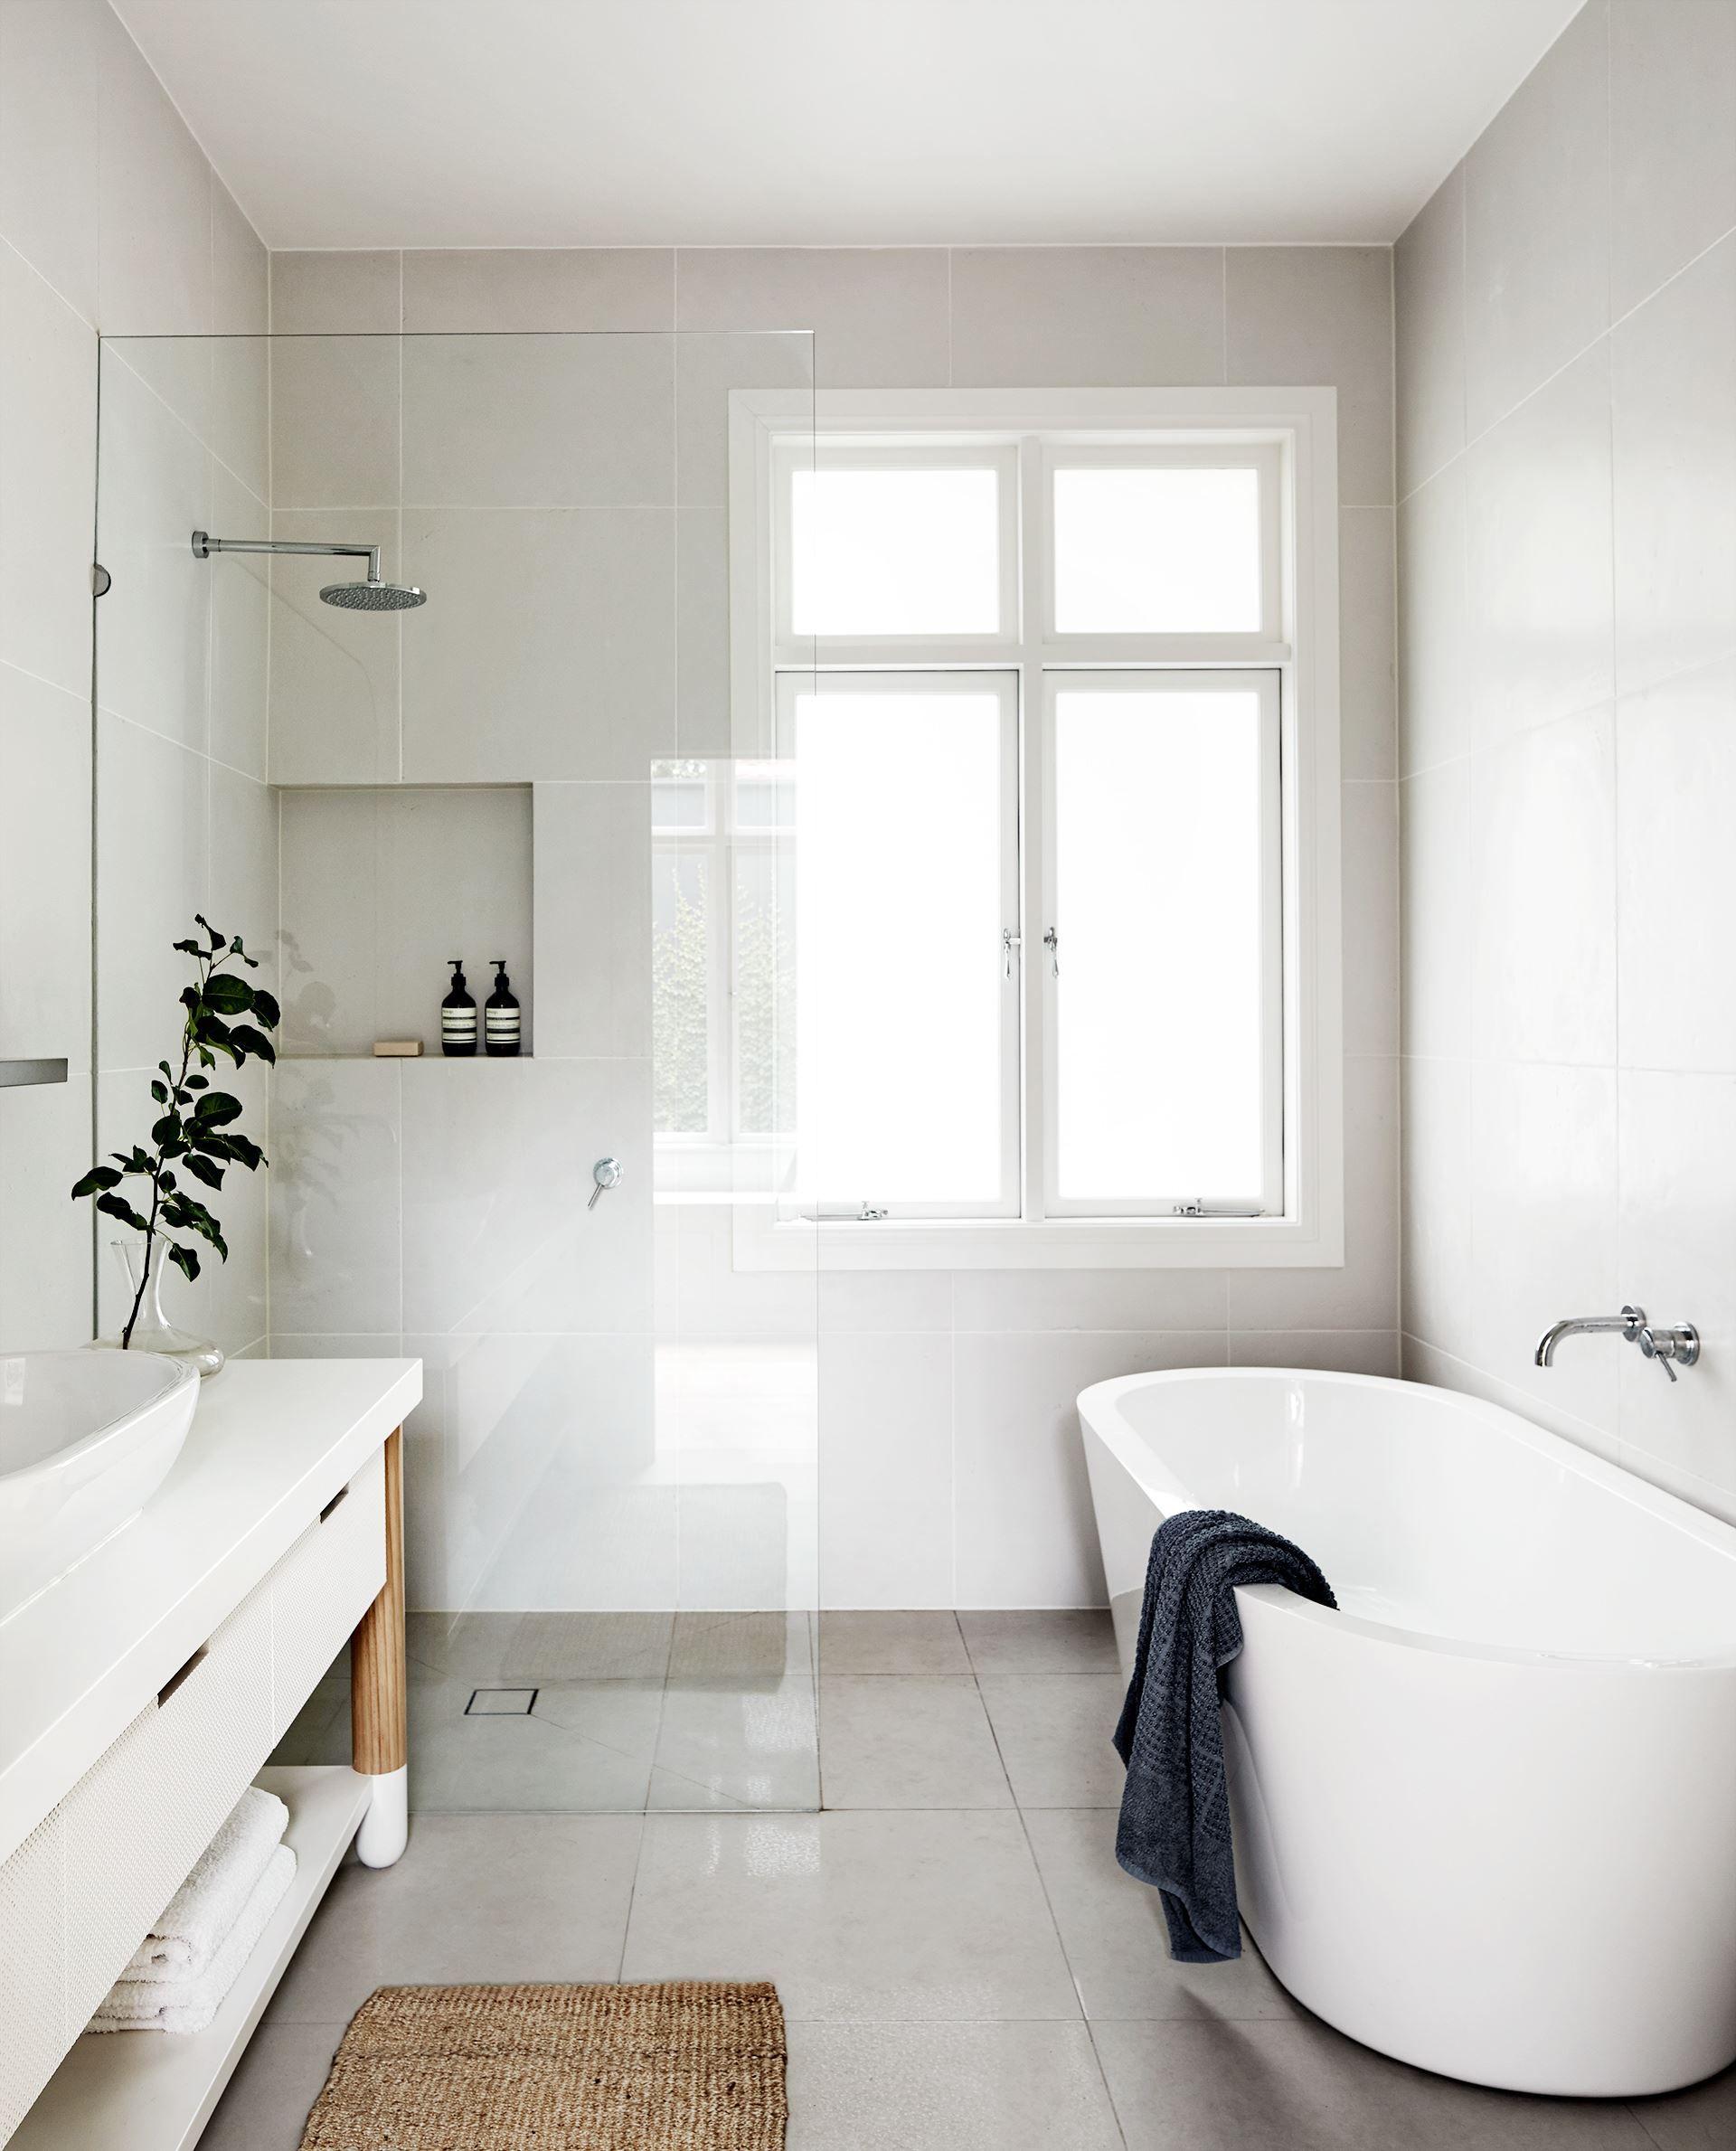 Luxury Bathrooms That Are Instant Classics Bathroom Layout